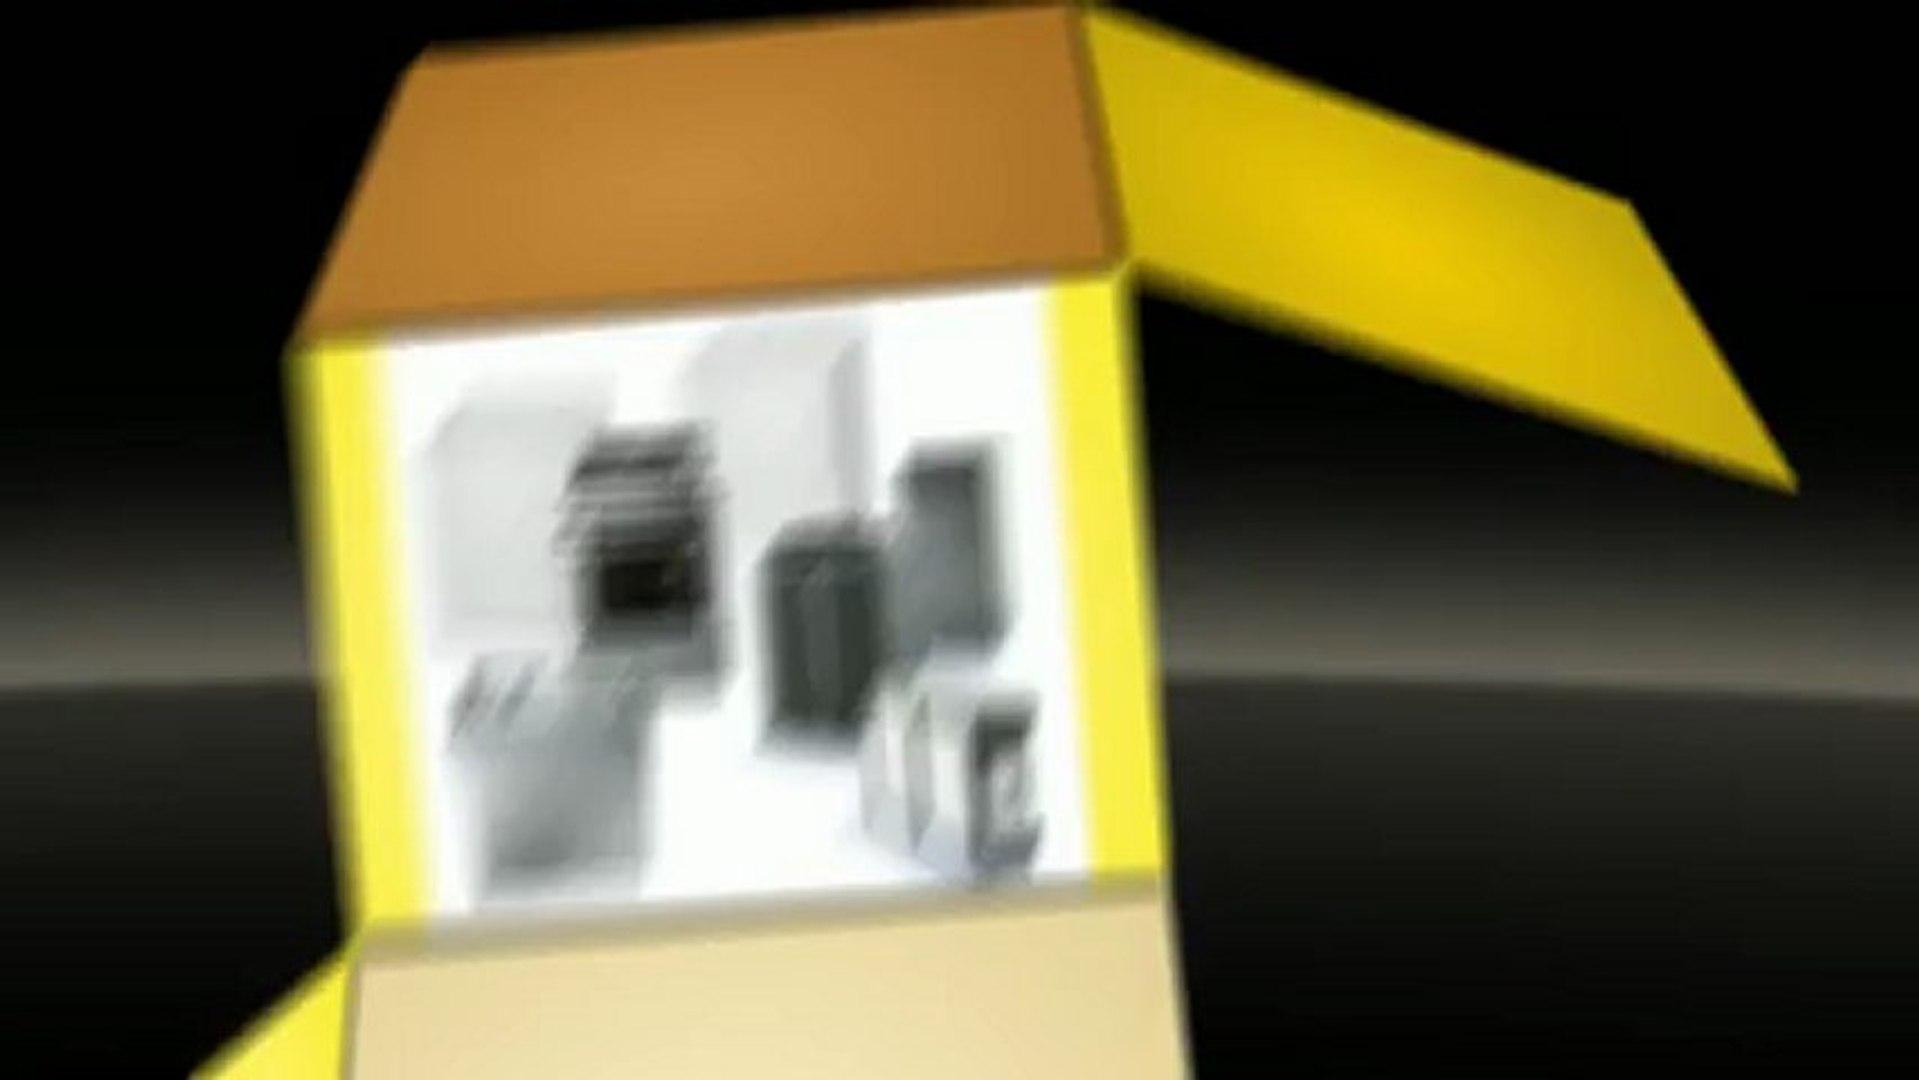 Appliance repair in santa clarita Ca Call 415-689-8180